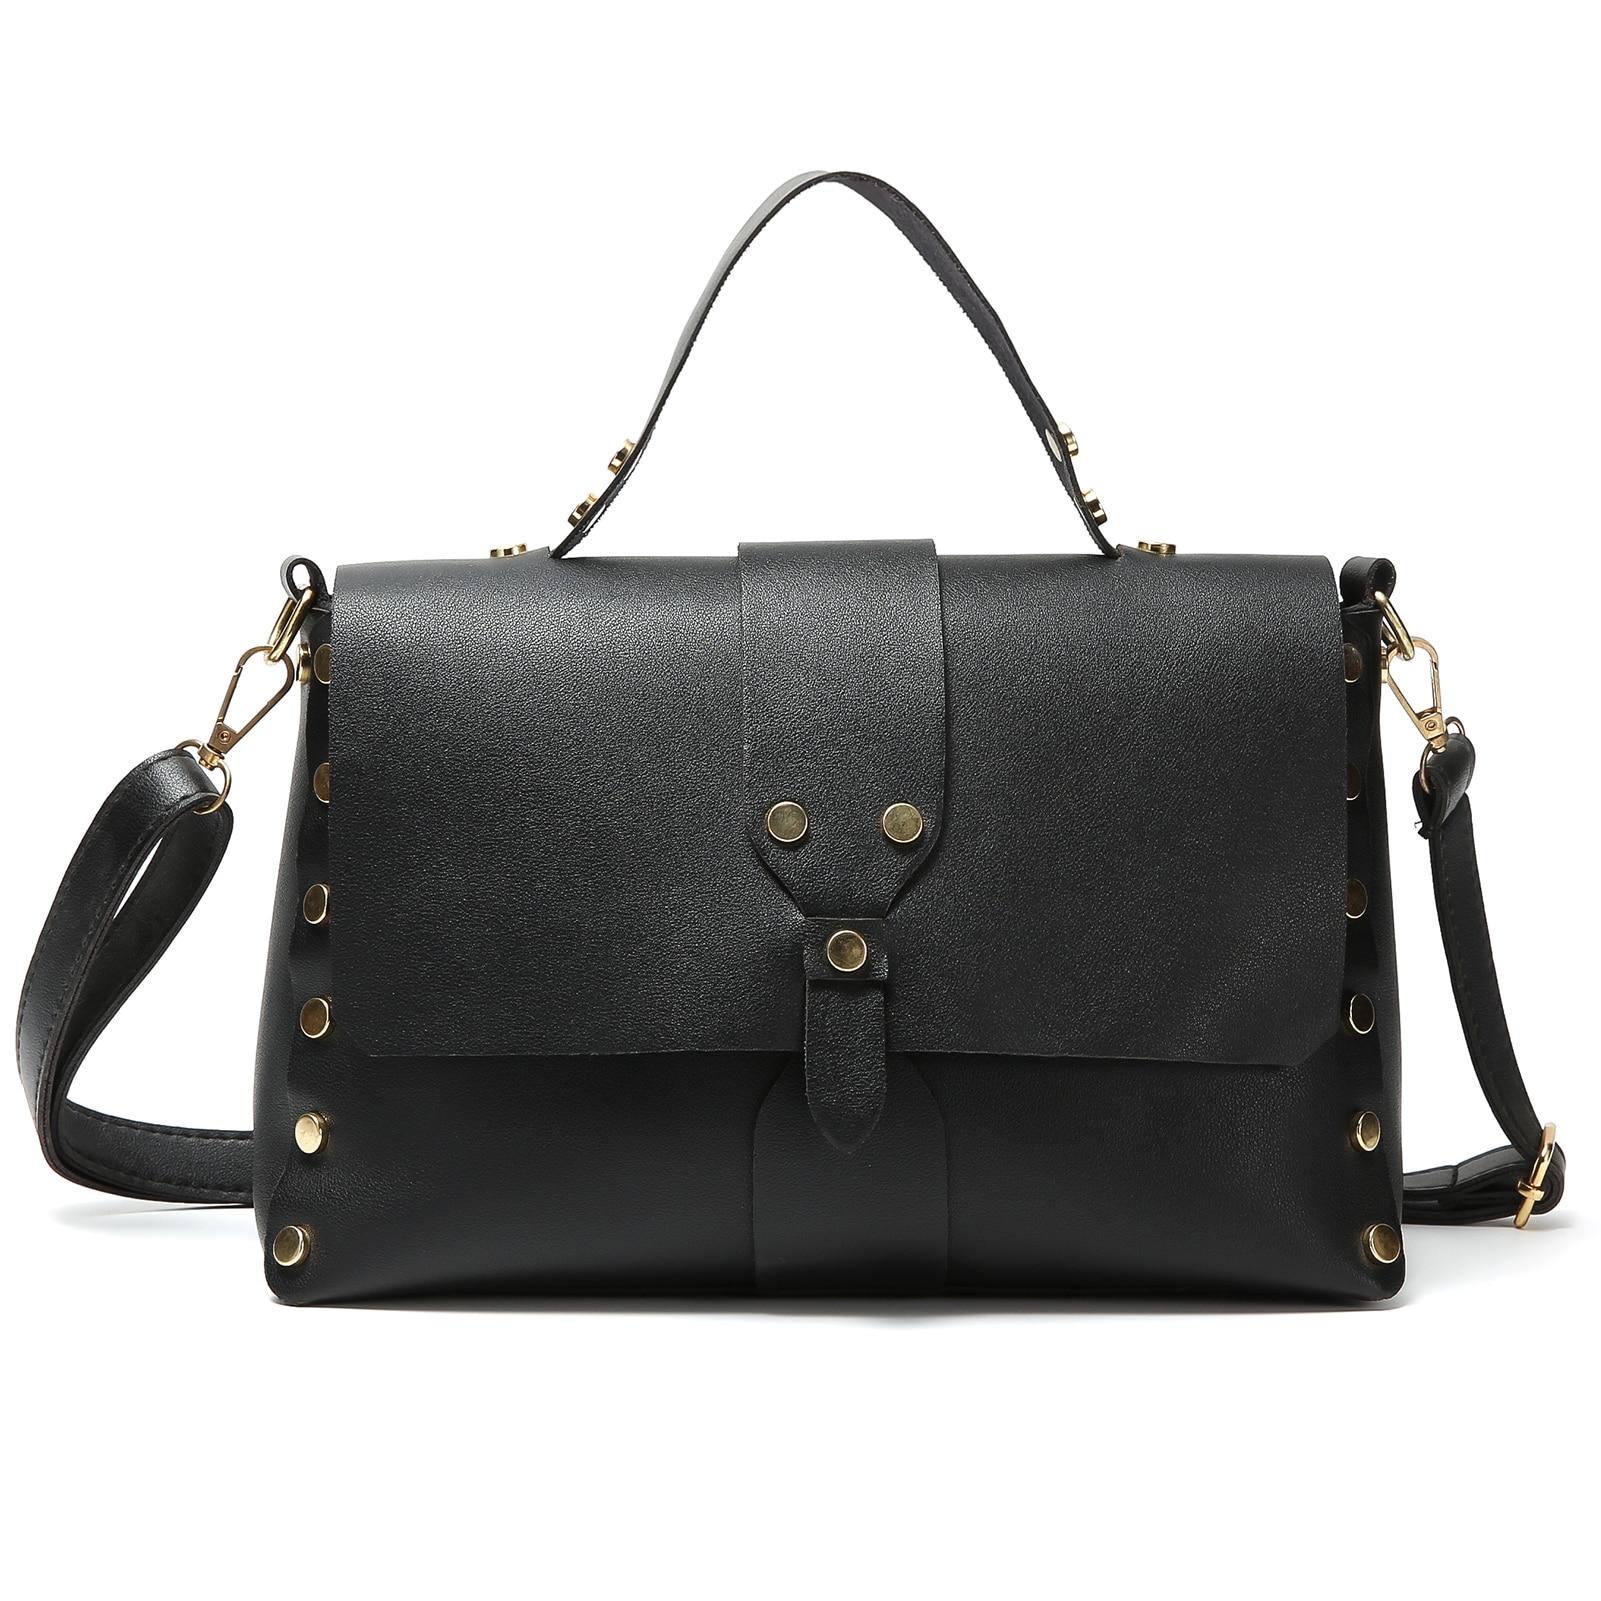 Soft casual tote shoulder messenger bag women's handbags female lady hand bags